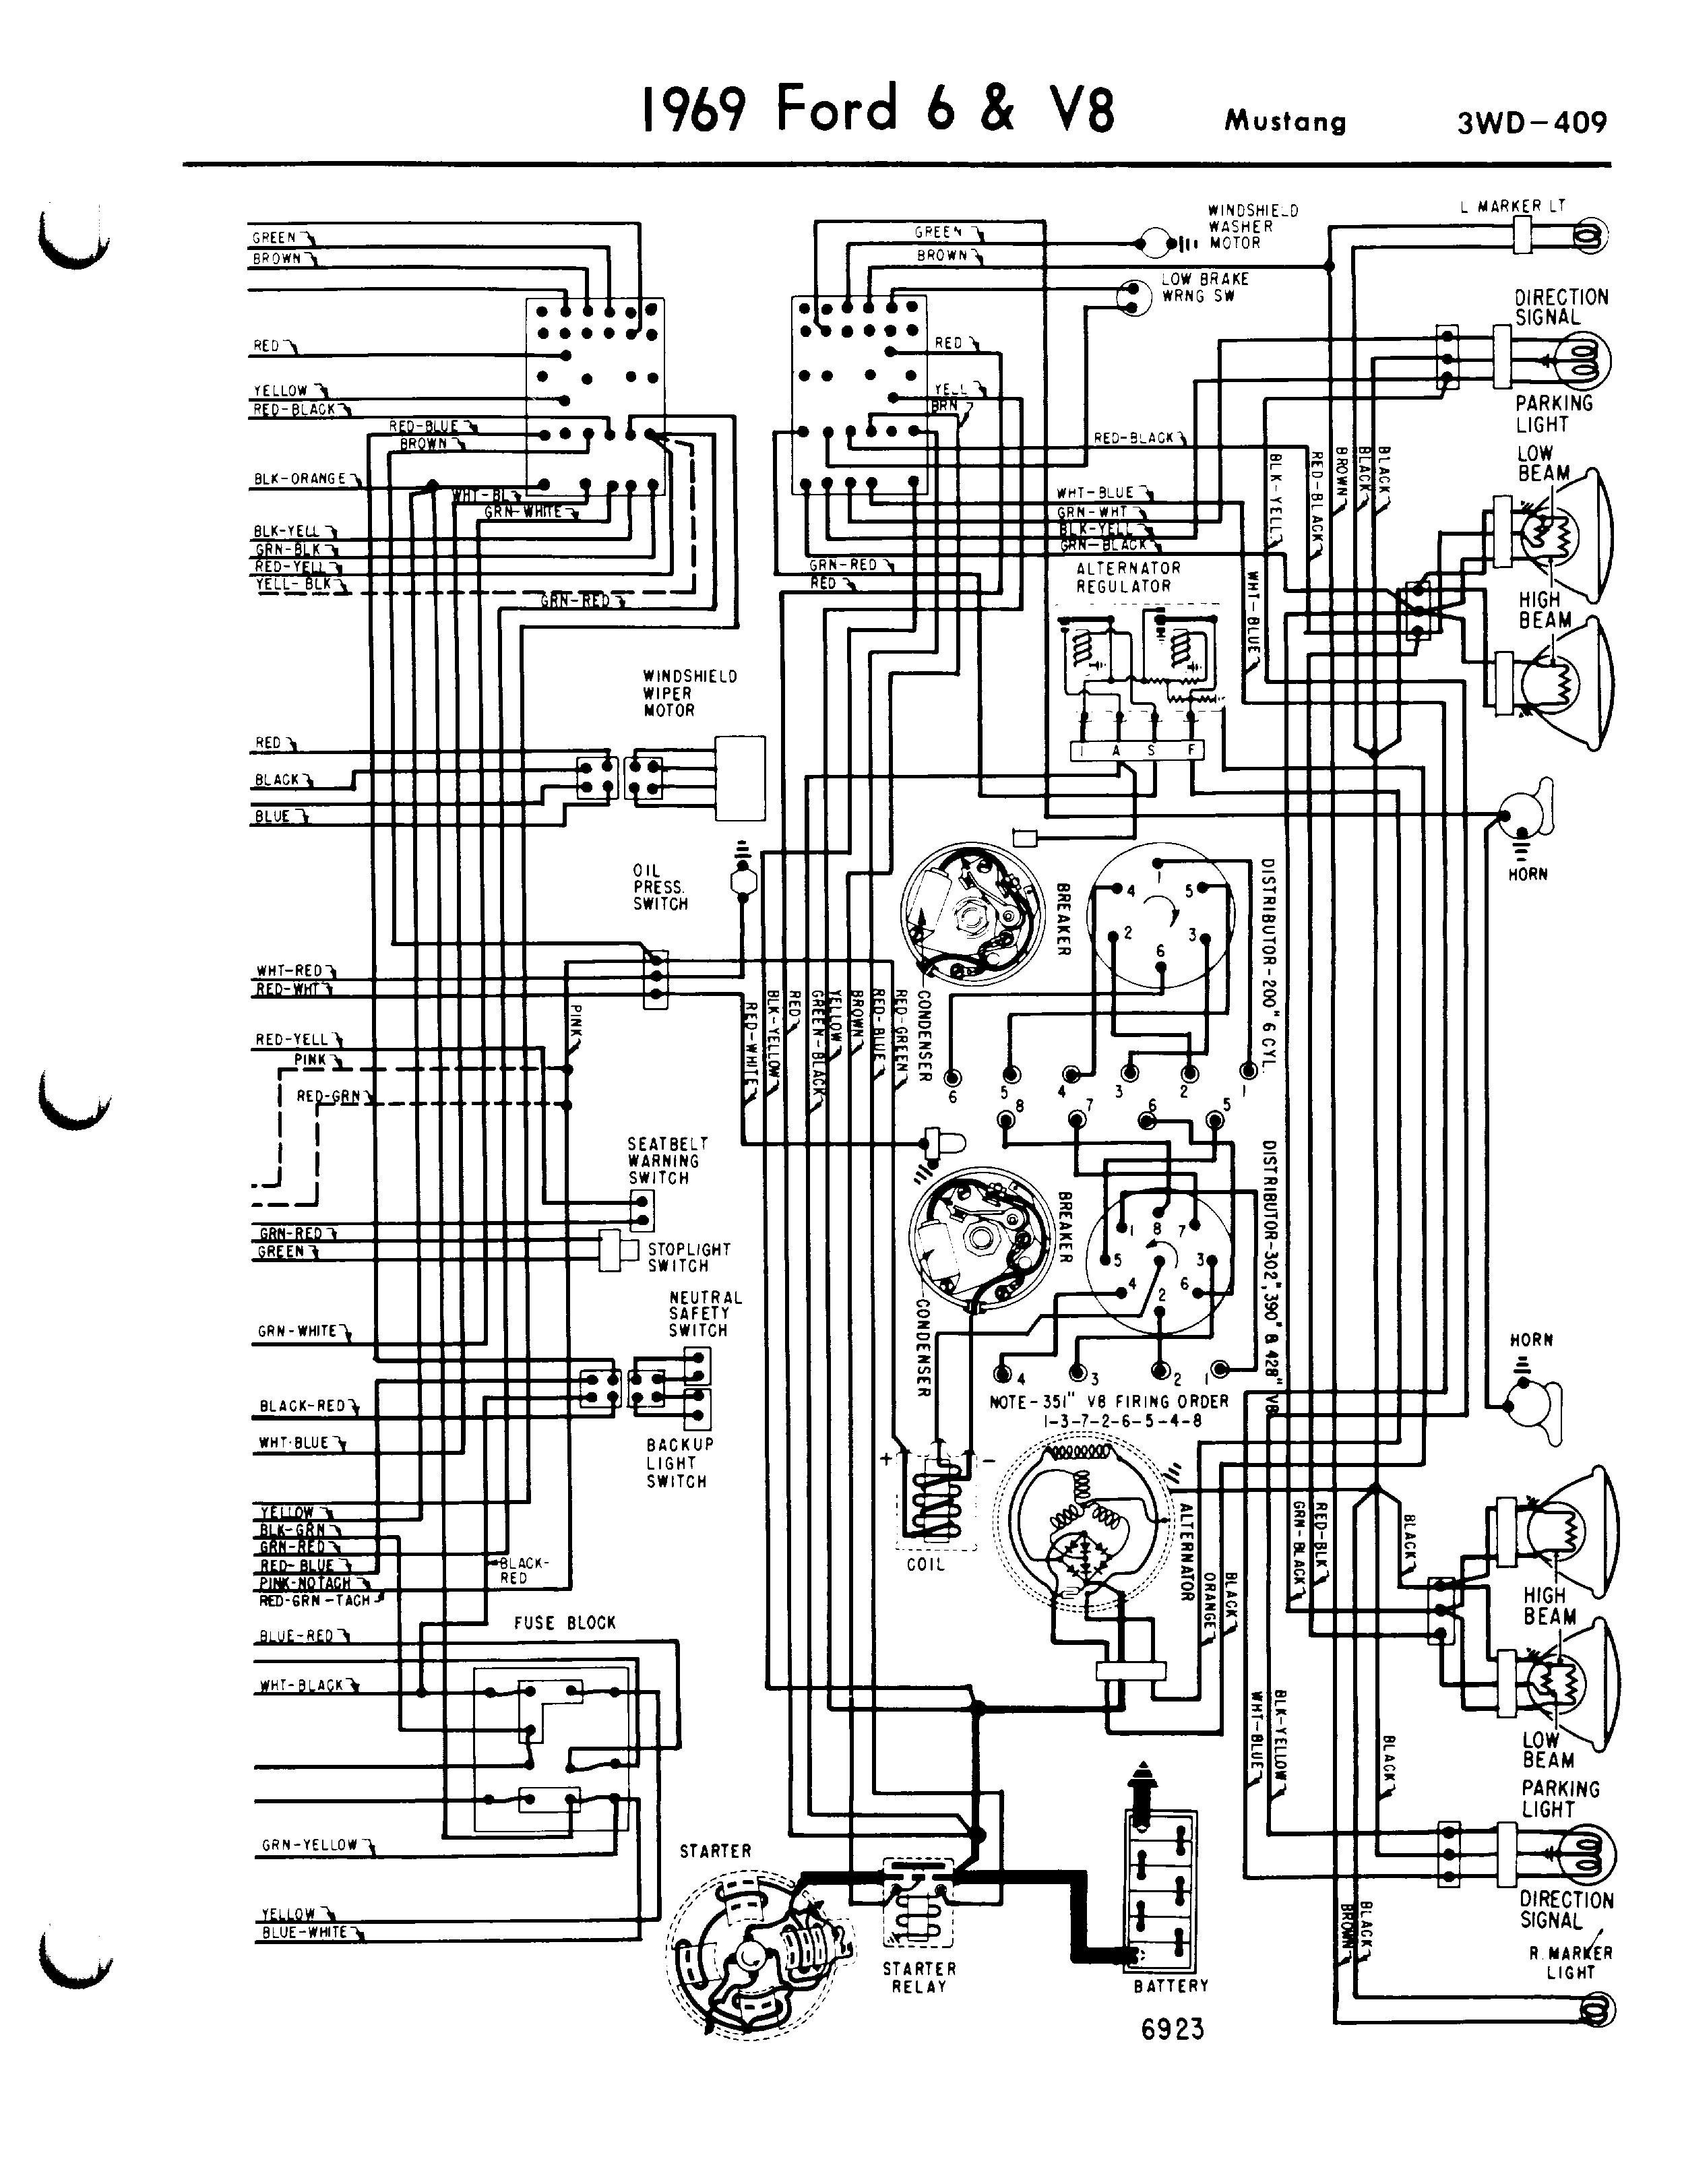 2001 Ford Focus Wiring Diagram In 2021 Mustang Engine Diagram 1968 Mustang